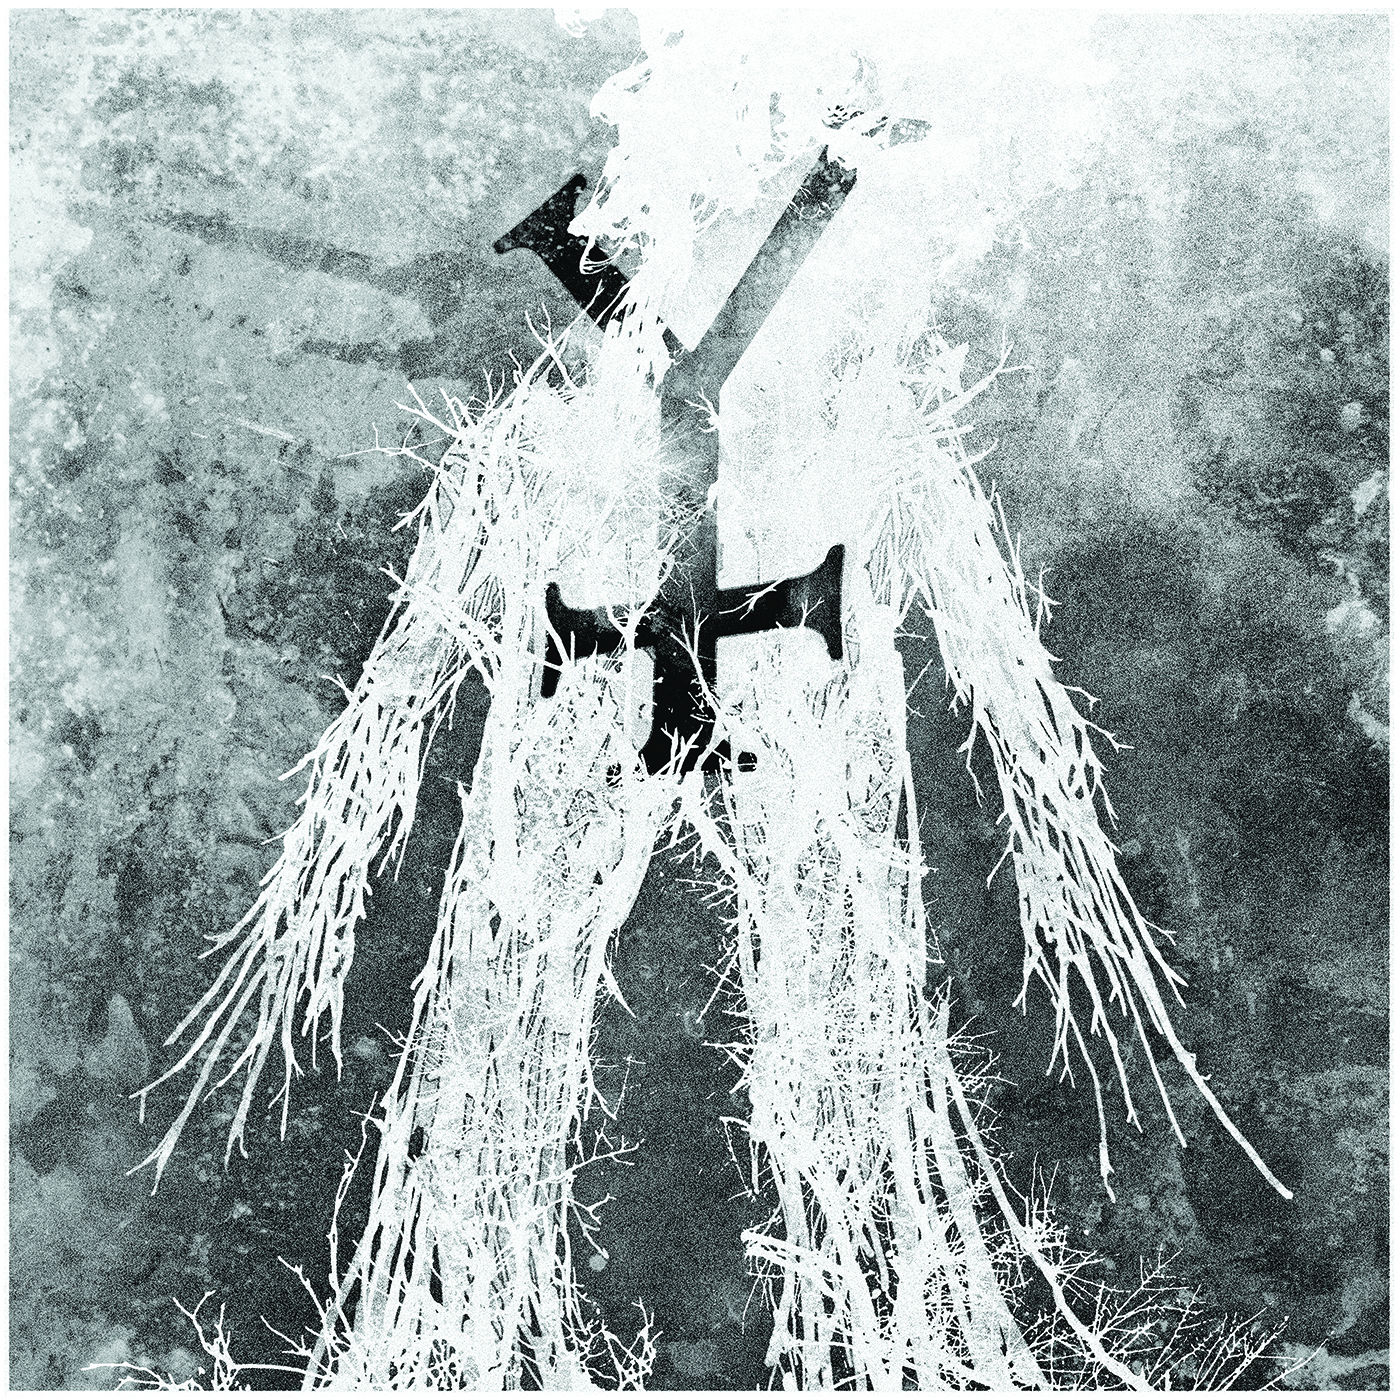 MZ412 Svartmyrkr LP - Lo res album cover for web